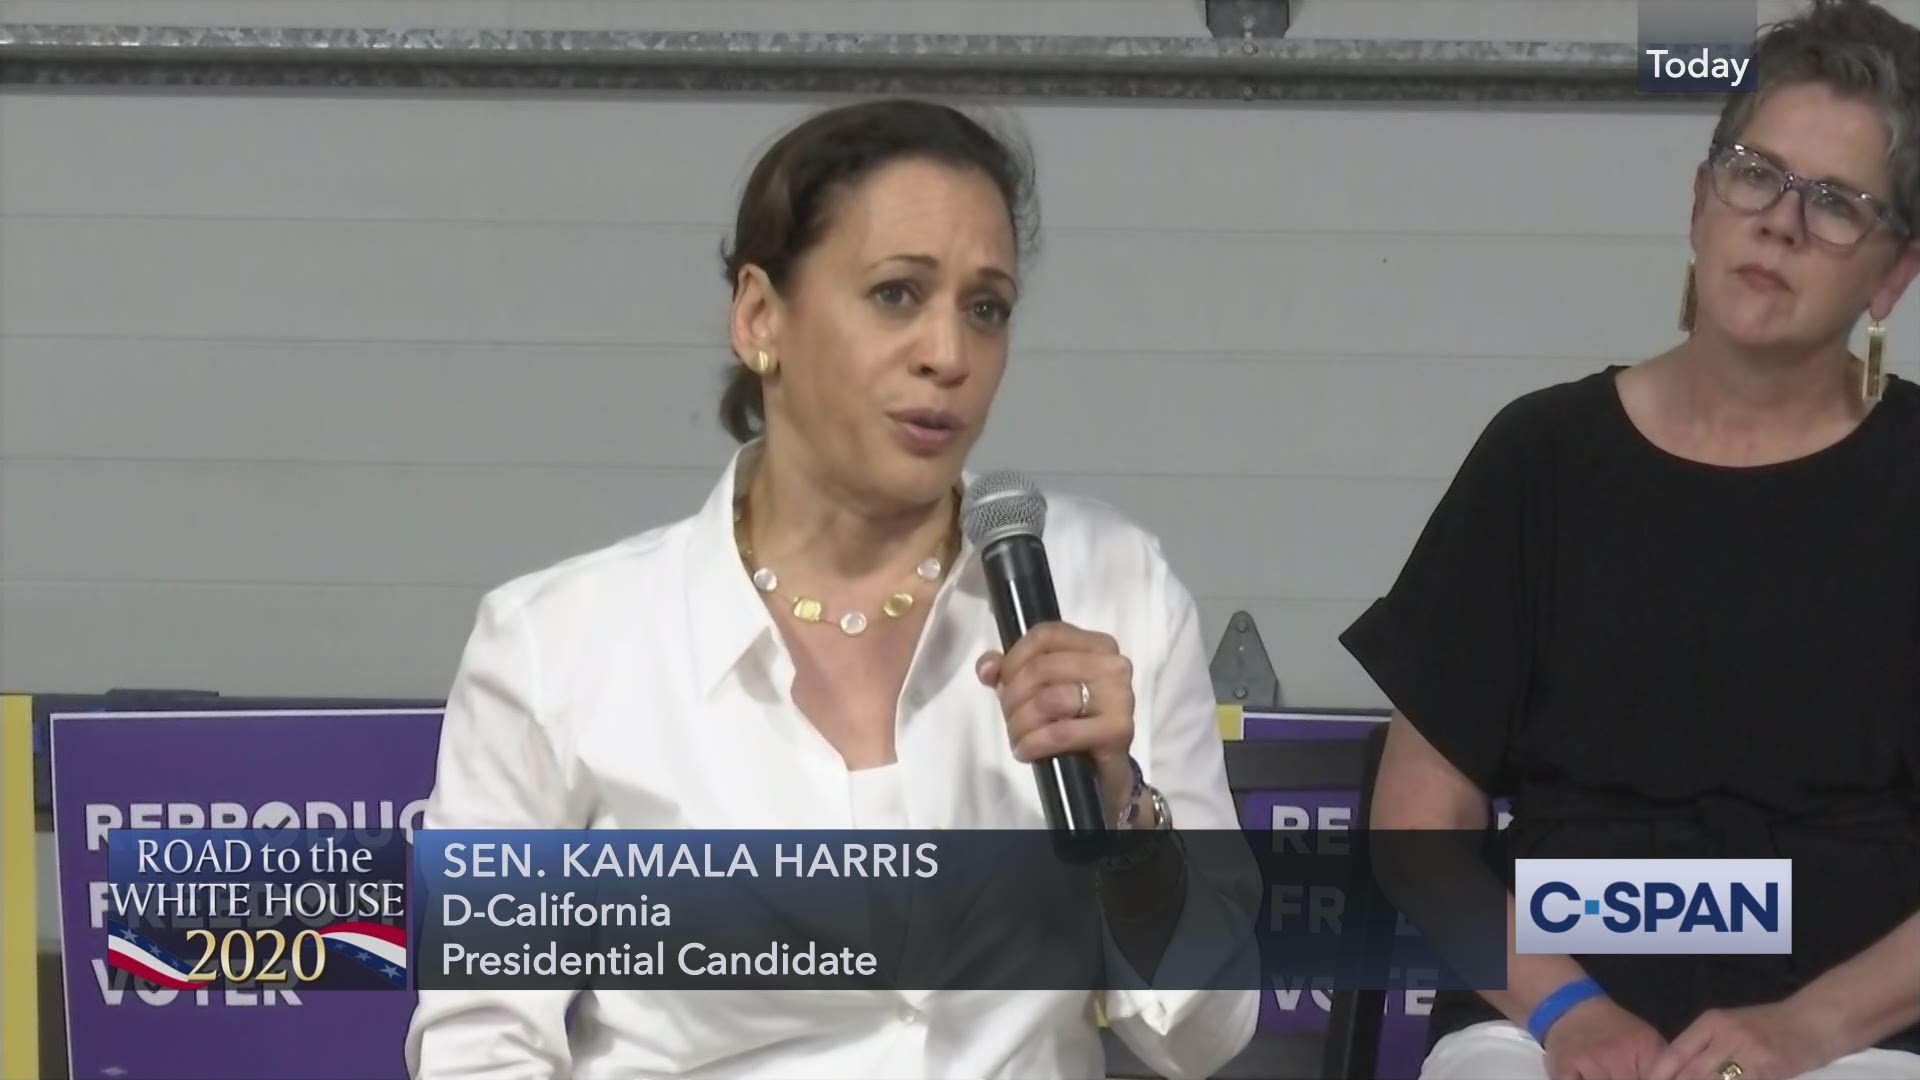 Senator Kamala Harris Town Hall In Des Moines Iowa C Span Org